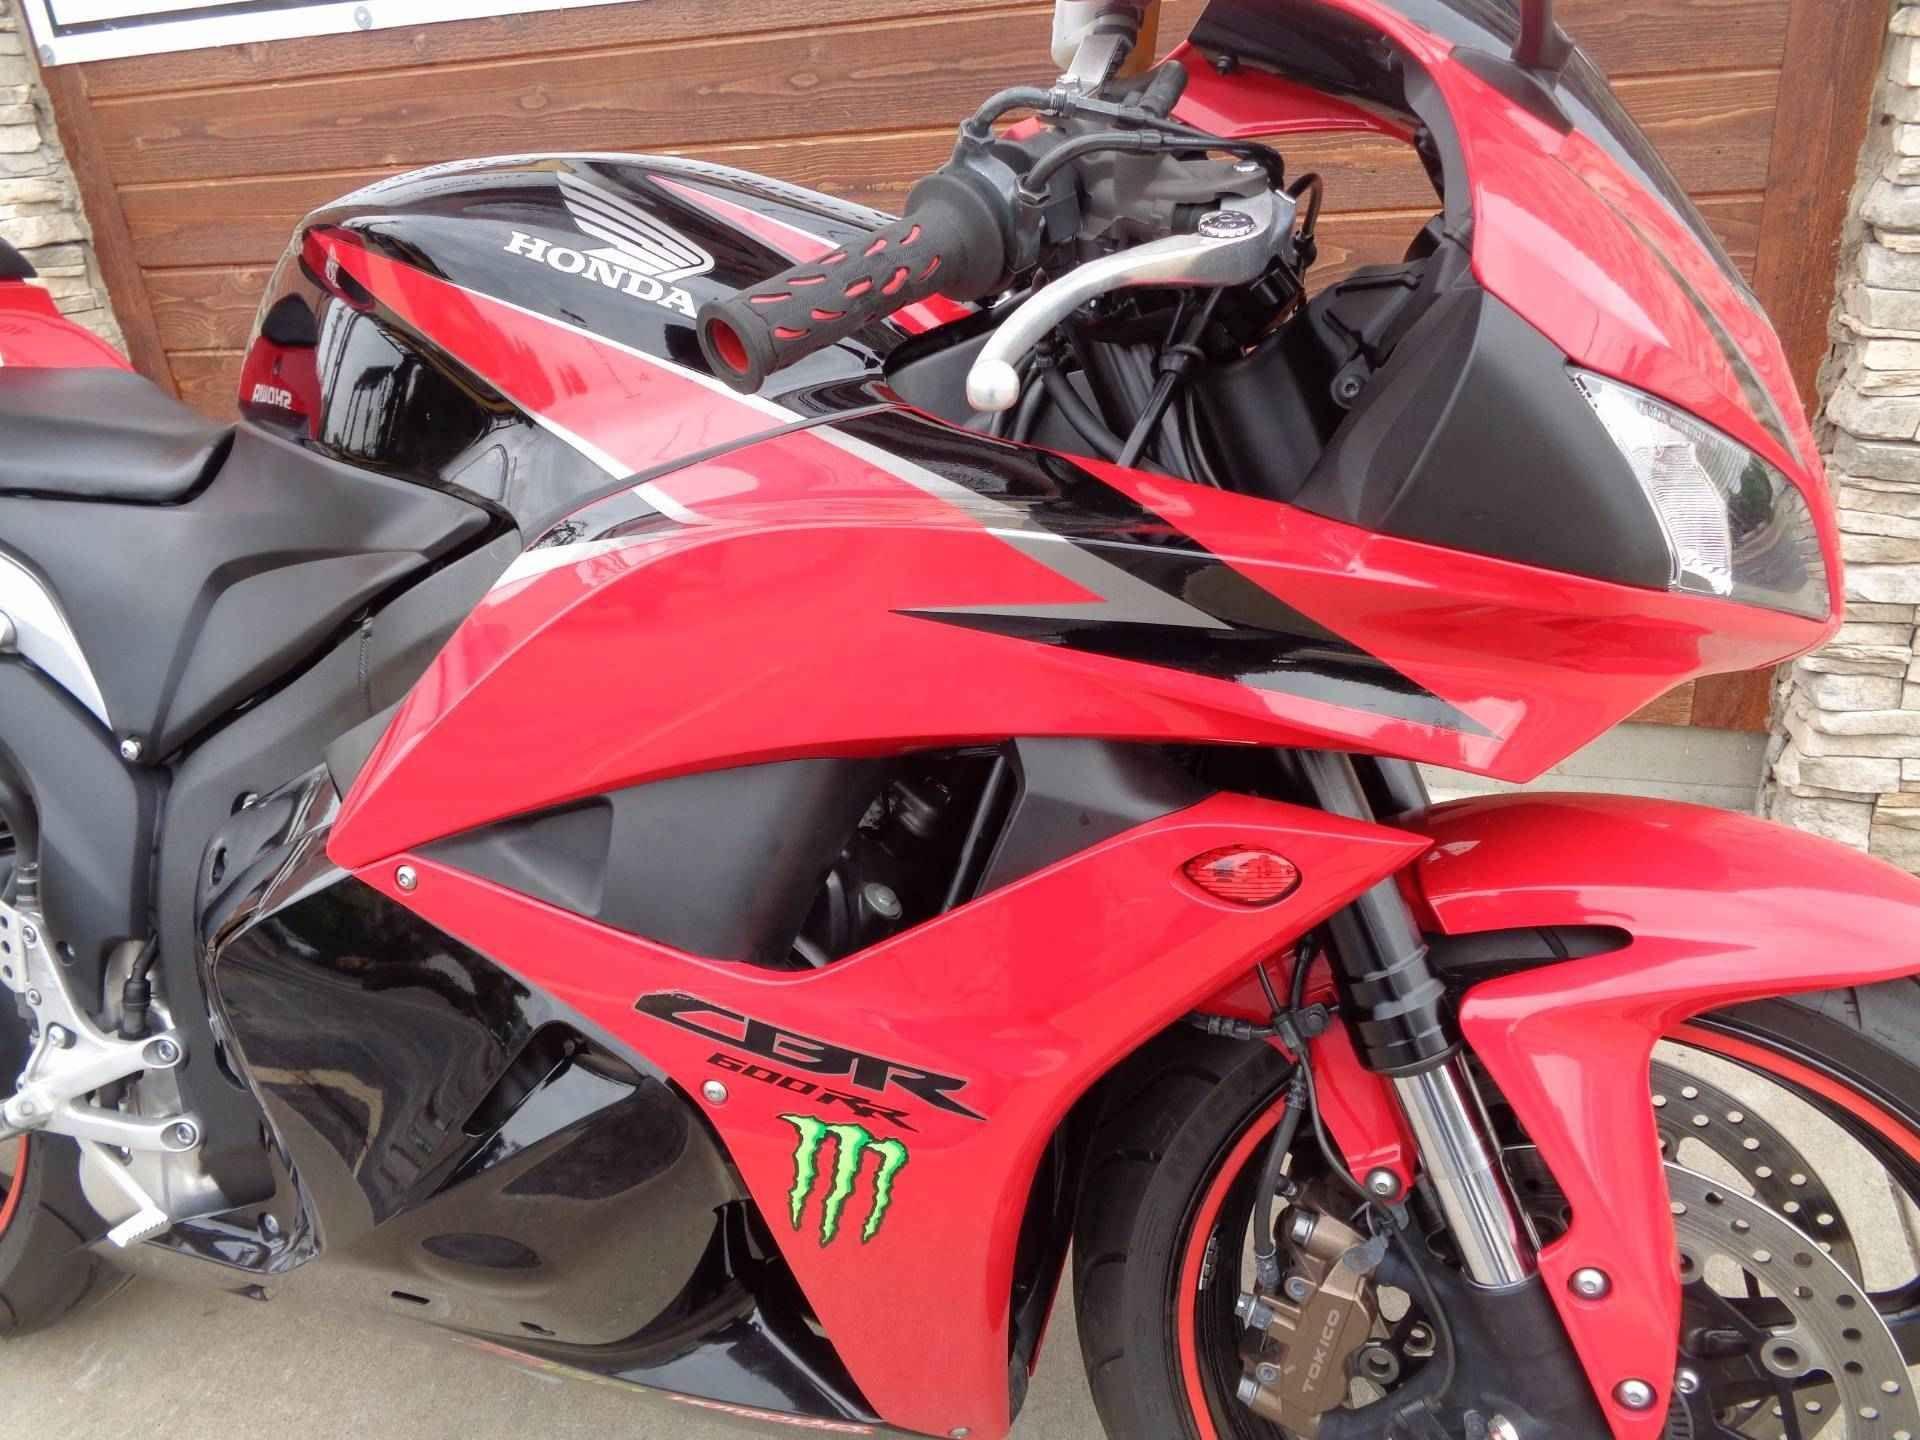 Used 2009 Honda CBR' 600RR Motorcycles For Sale in Oklahoma OK